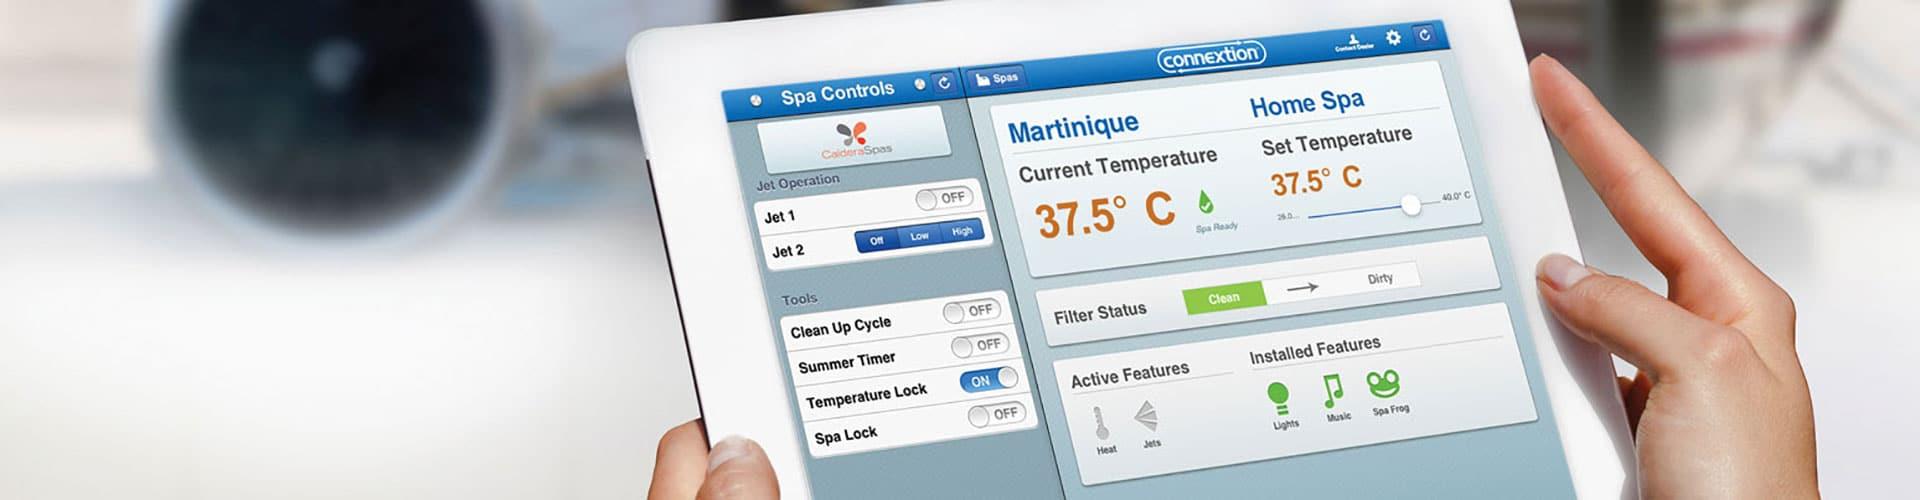 Caldera Spas Connextion App - Remote Spa Monitoring System